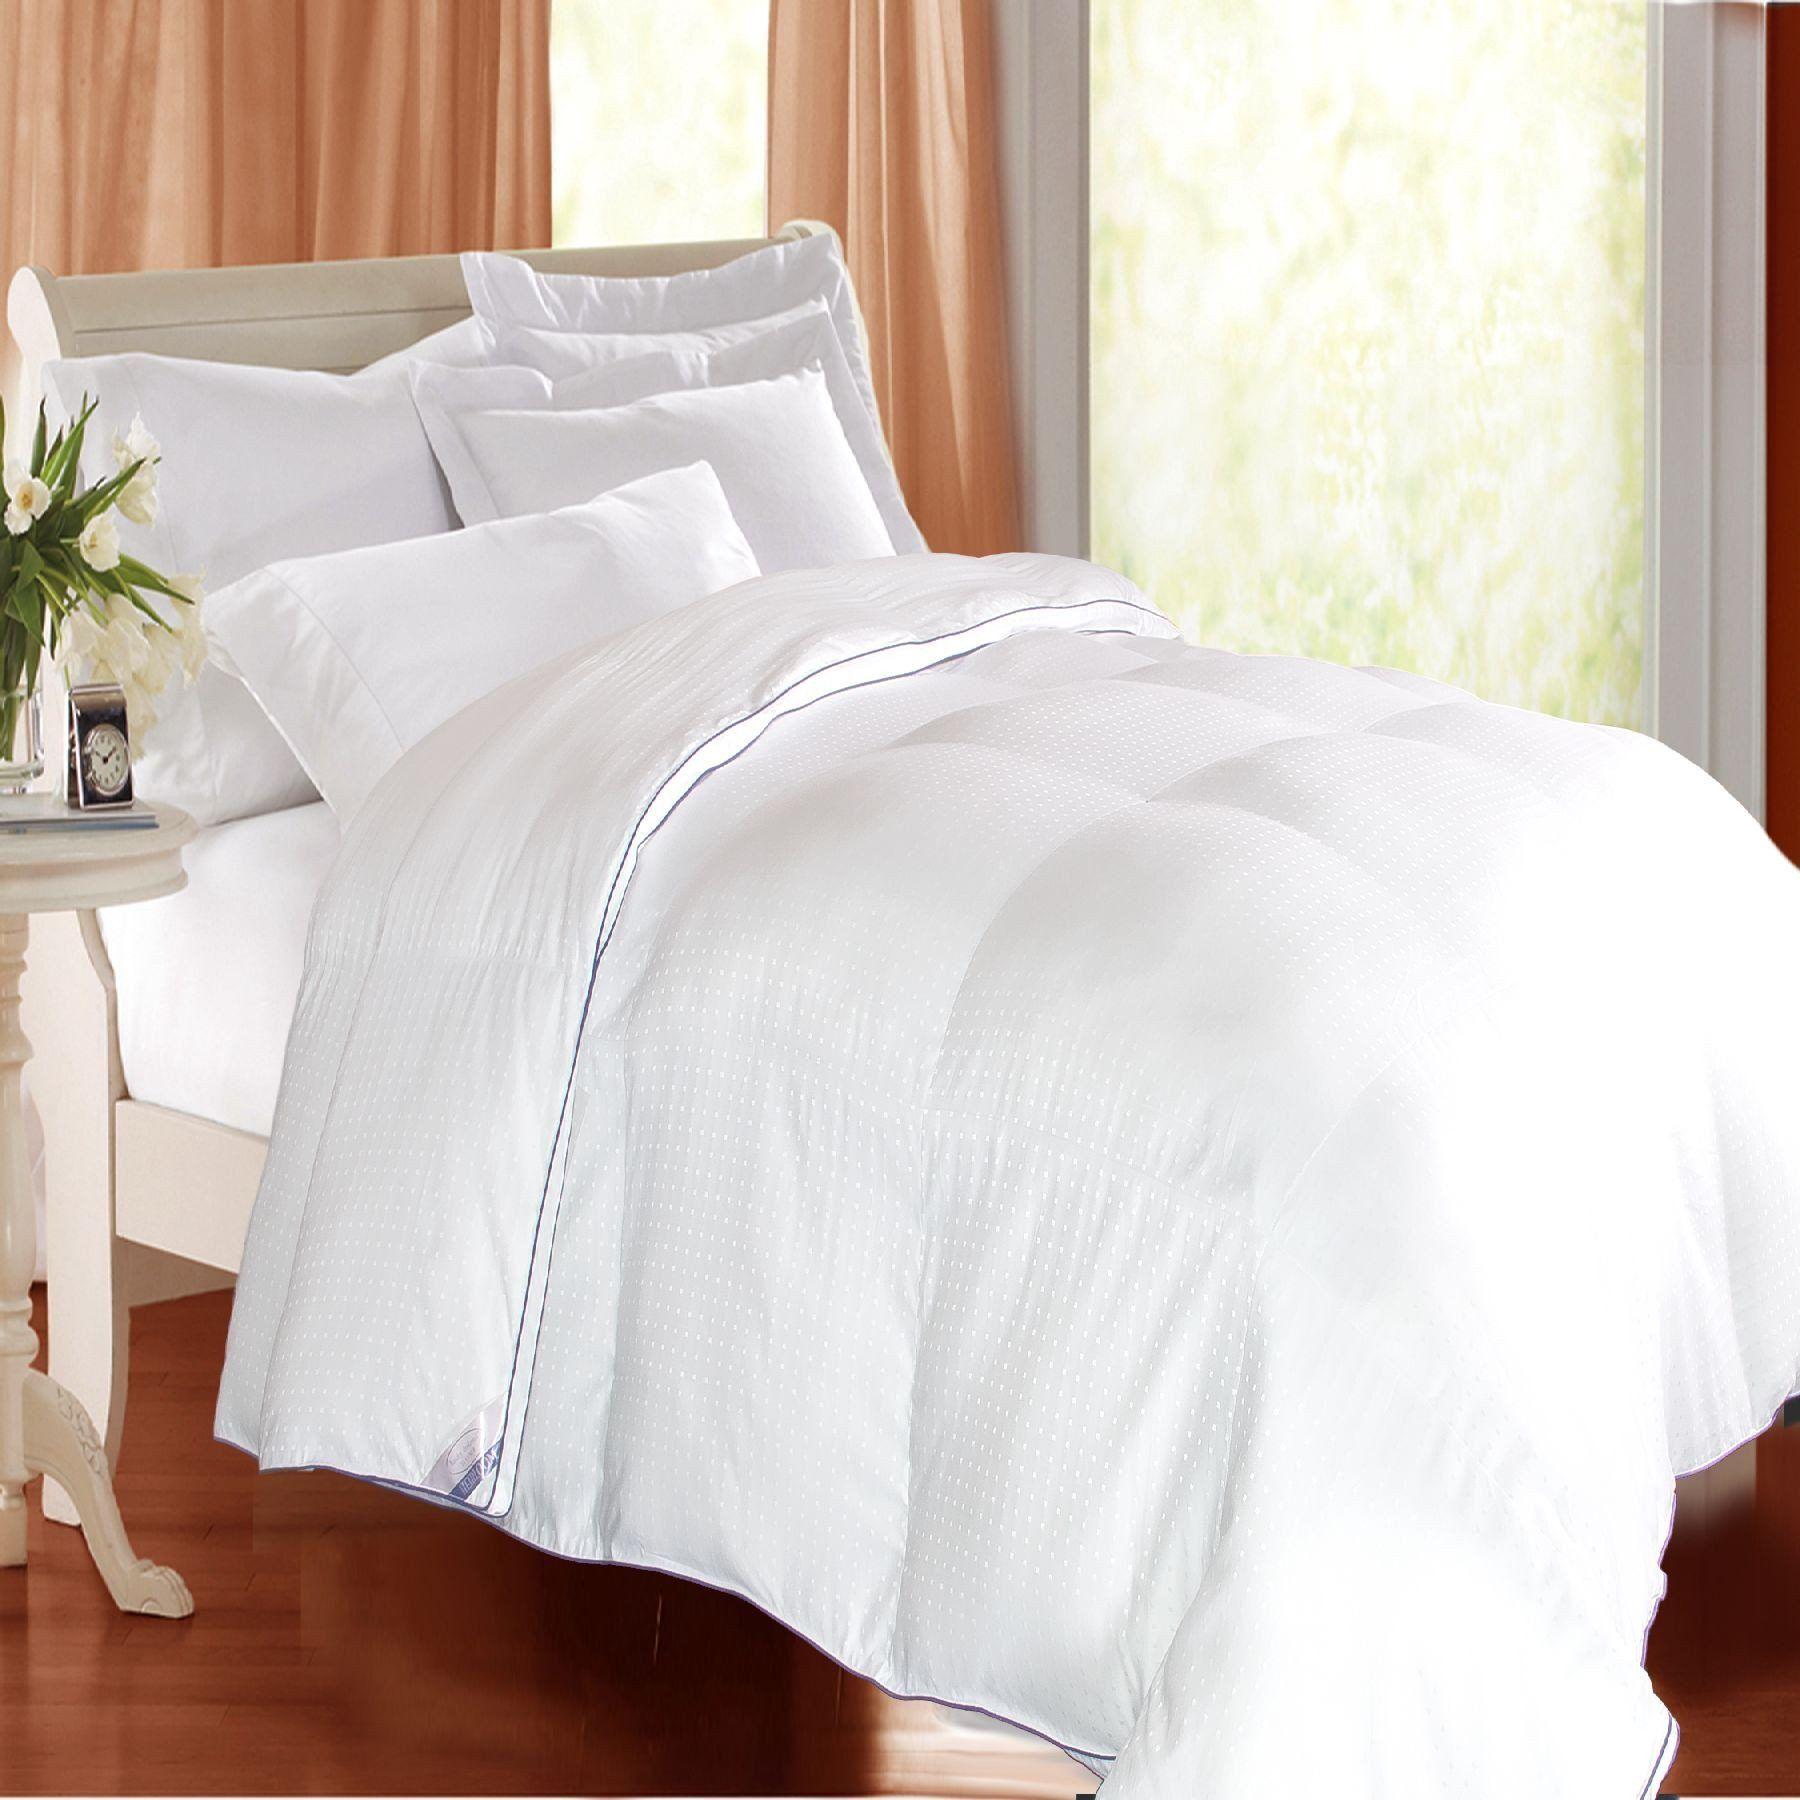 Kathy Ireland Home Heirloom 1000 Thread Count Cotton Rich